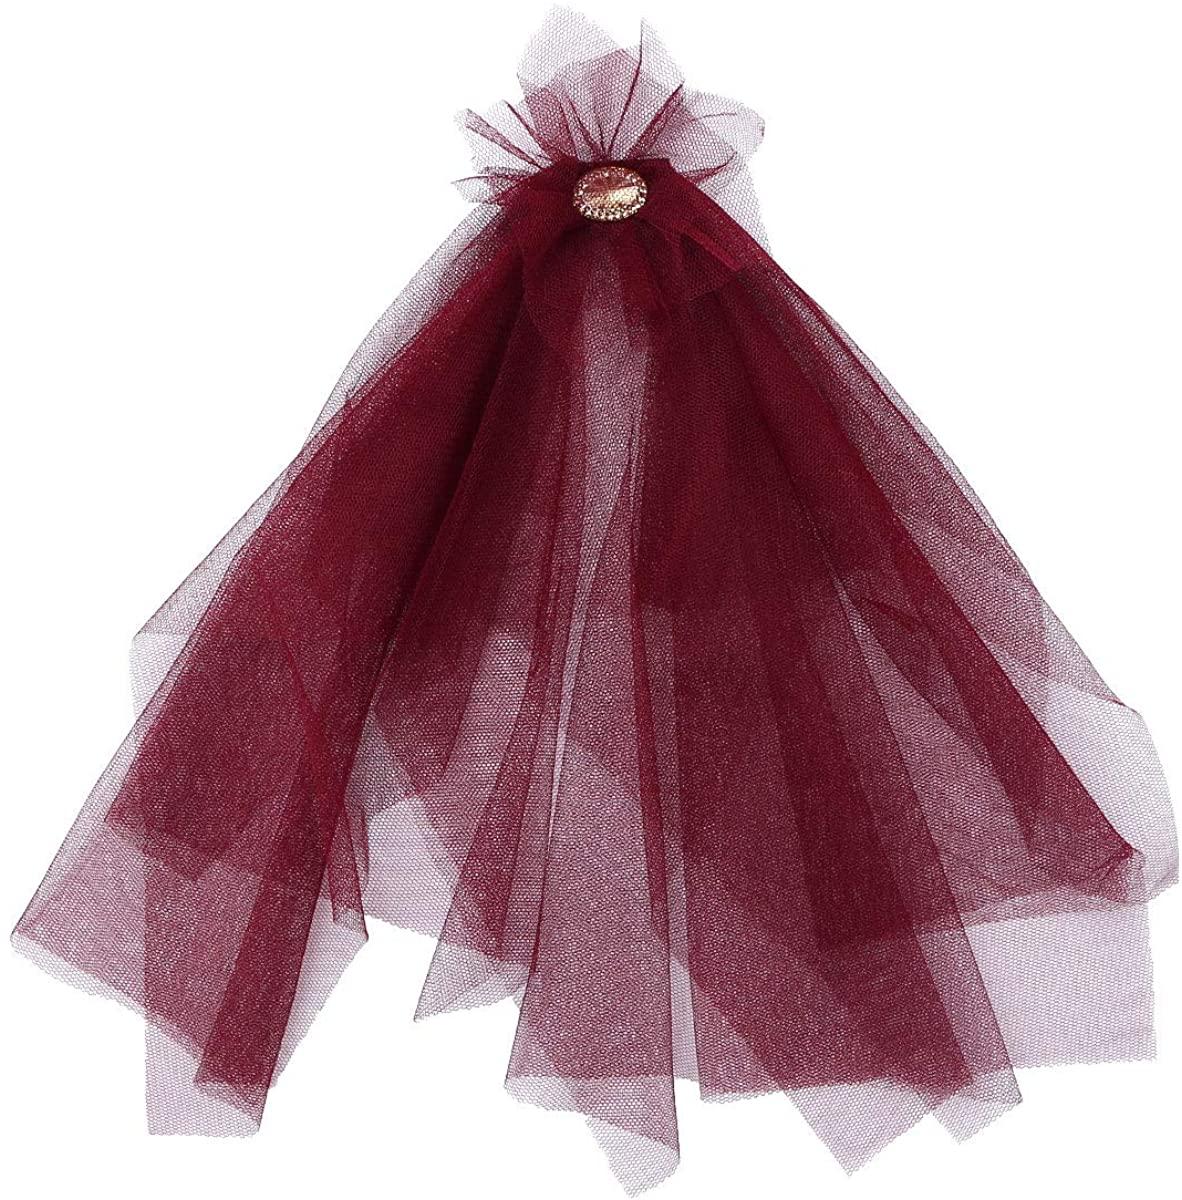 TiaoBug Gothic Victorian Ruffled Mesh Shoulder Epaulets with Rhinestone for Wedding Banquet